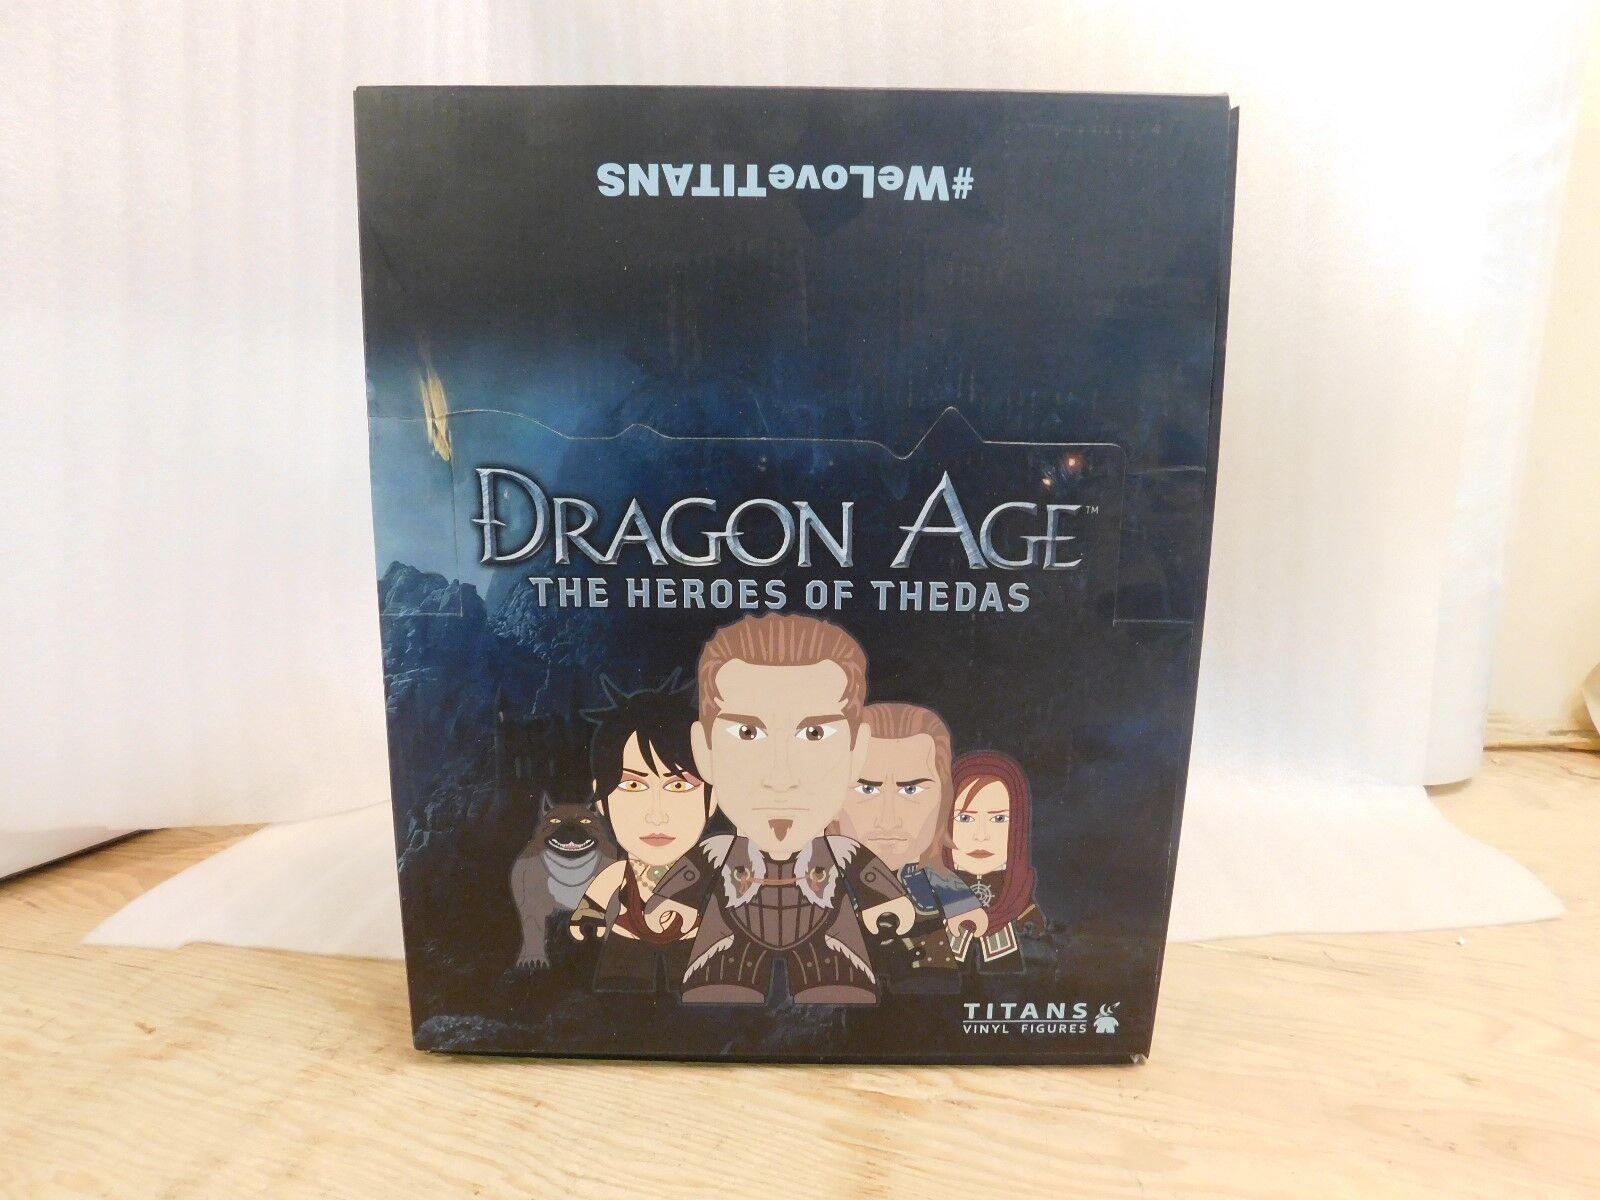 Dragon Age Heroes of Thedas Titans Titan Vinyl Display Blind Box Case of 20